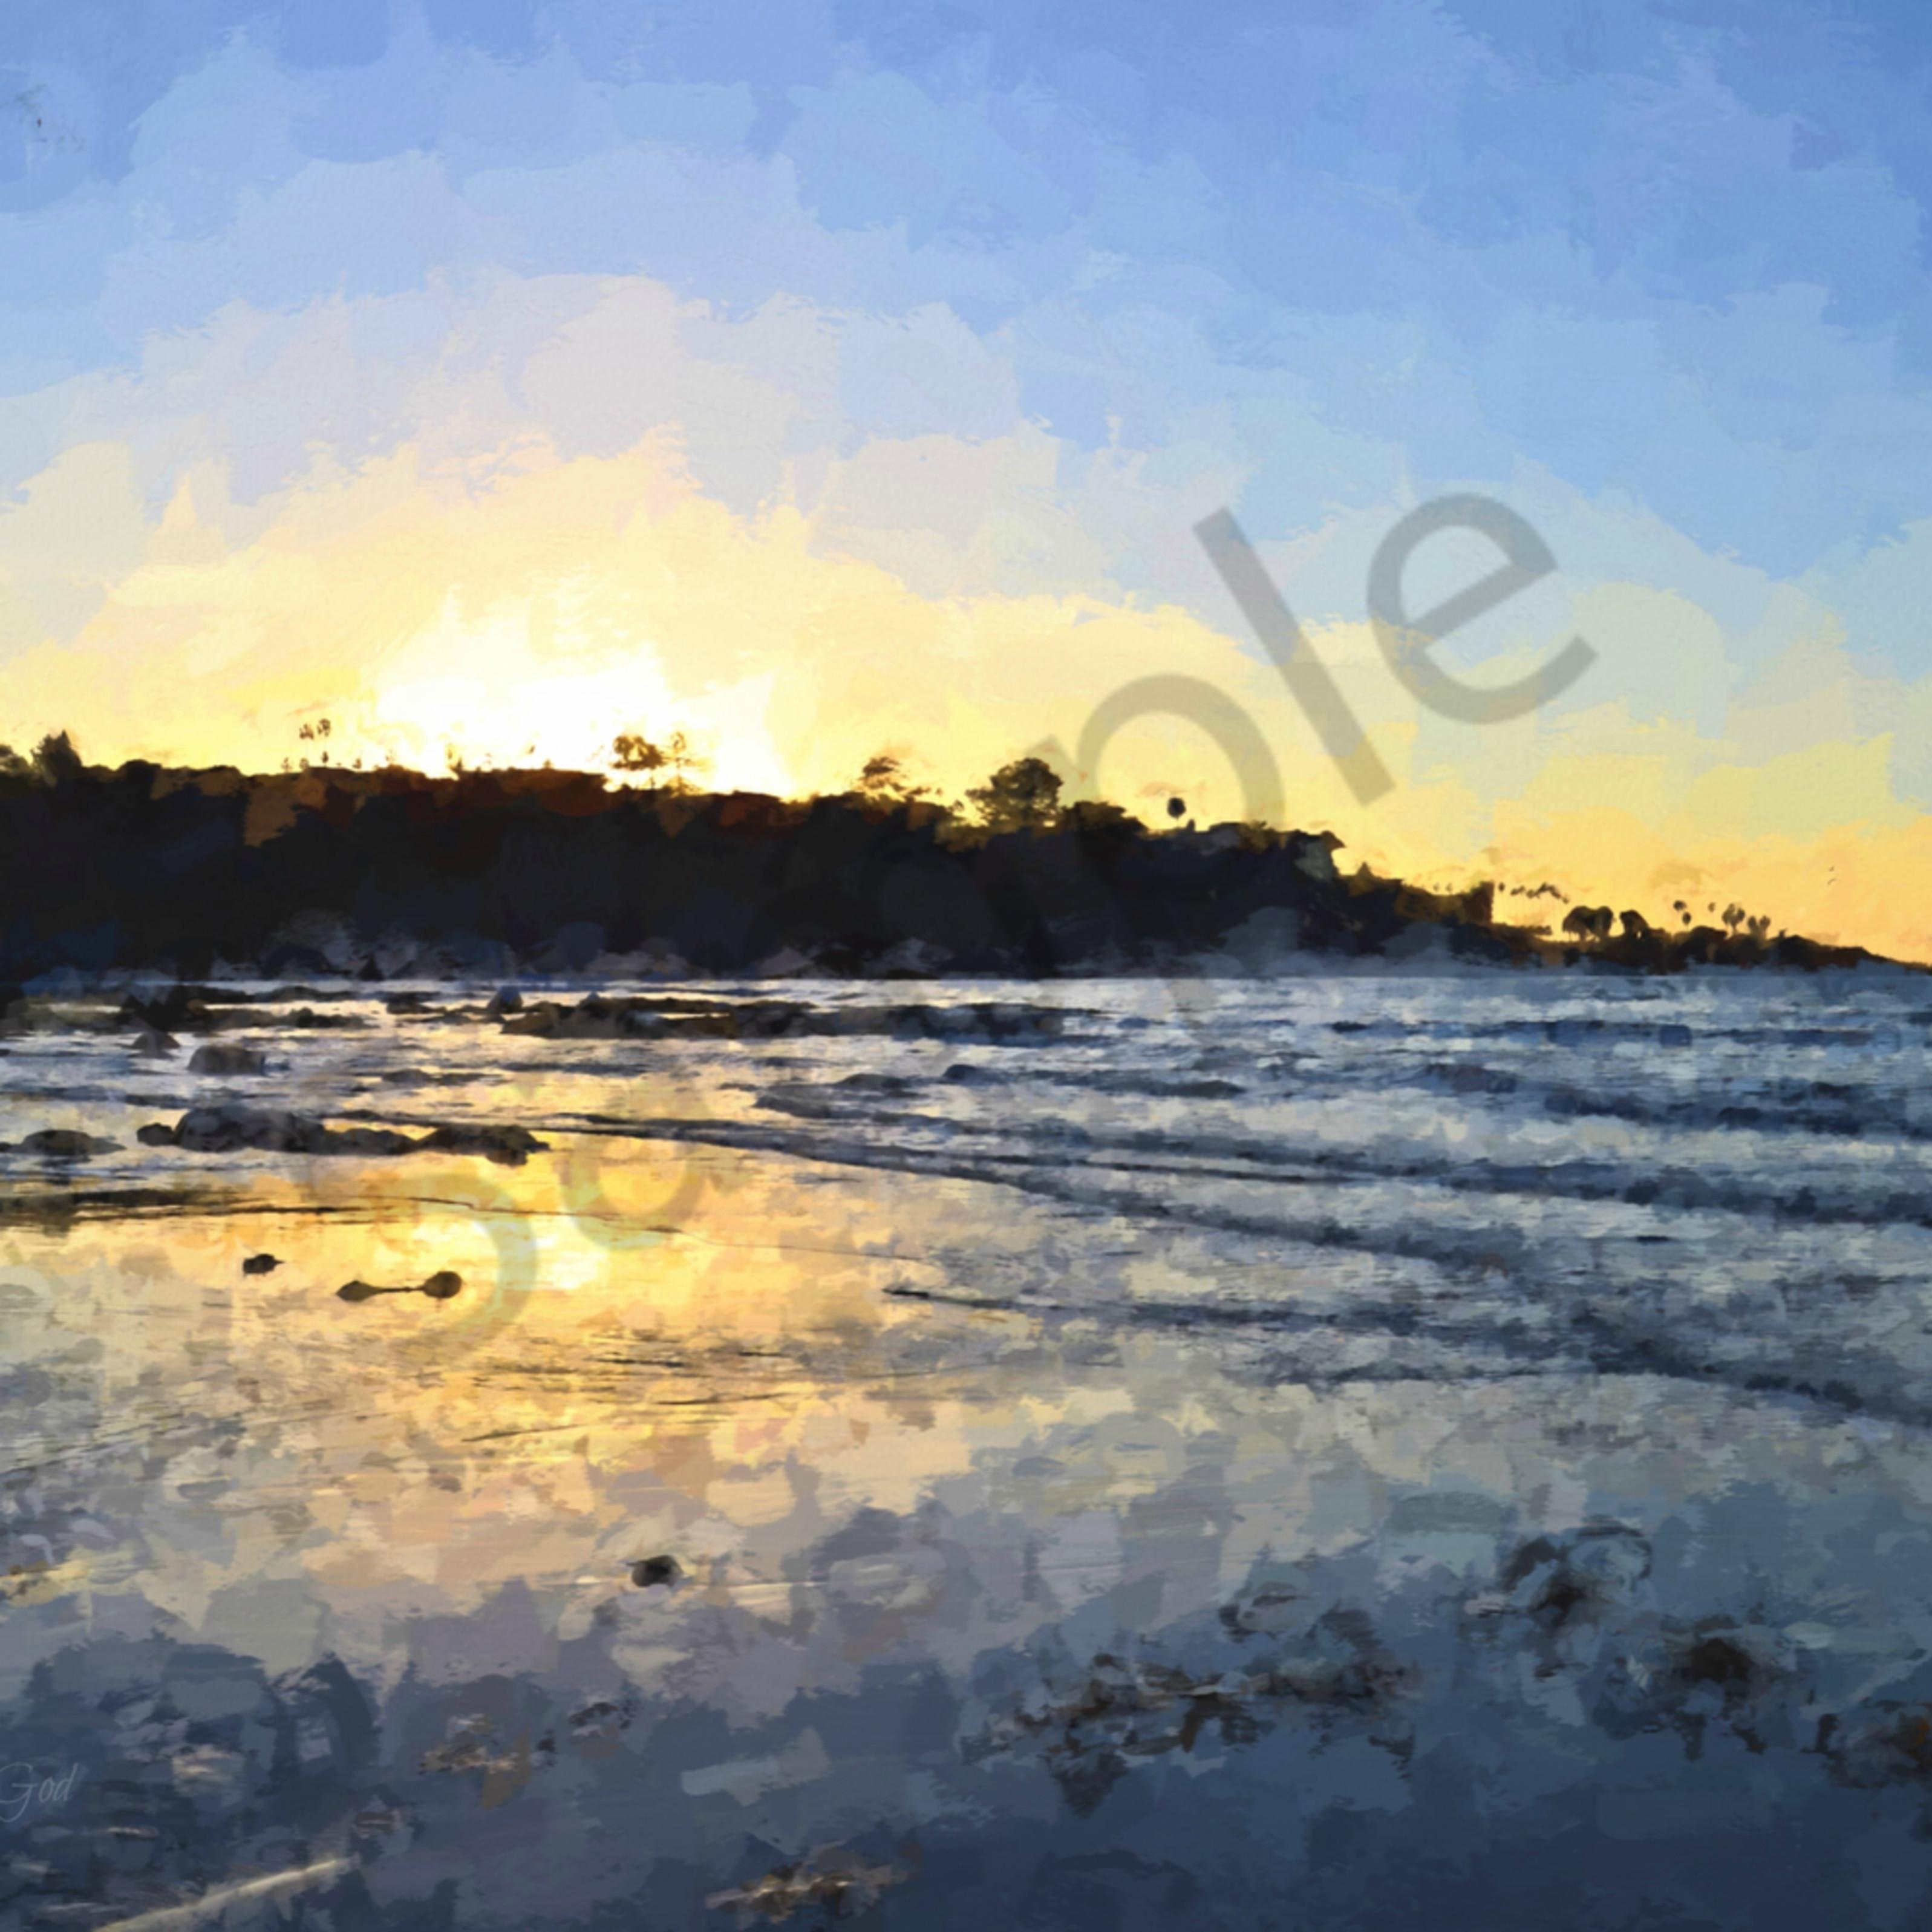 Dsc 6977 monet sunset at la jolla shores nr clsr   topaz tag xylbua